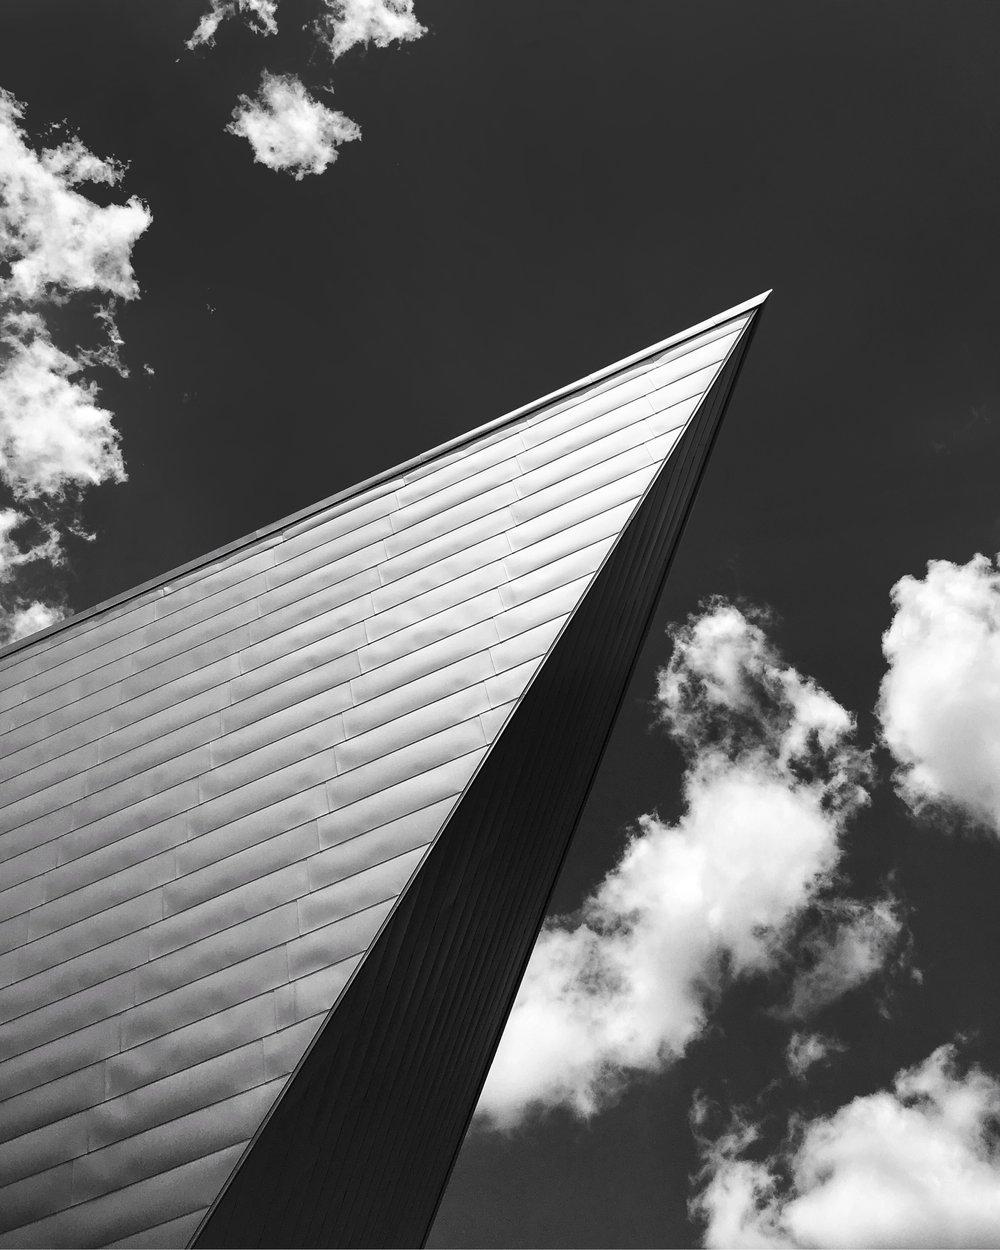 Denver Art Museum byStudio Libeskind. iPhone 6S photo© Miller Taylor